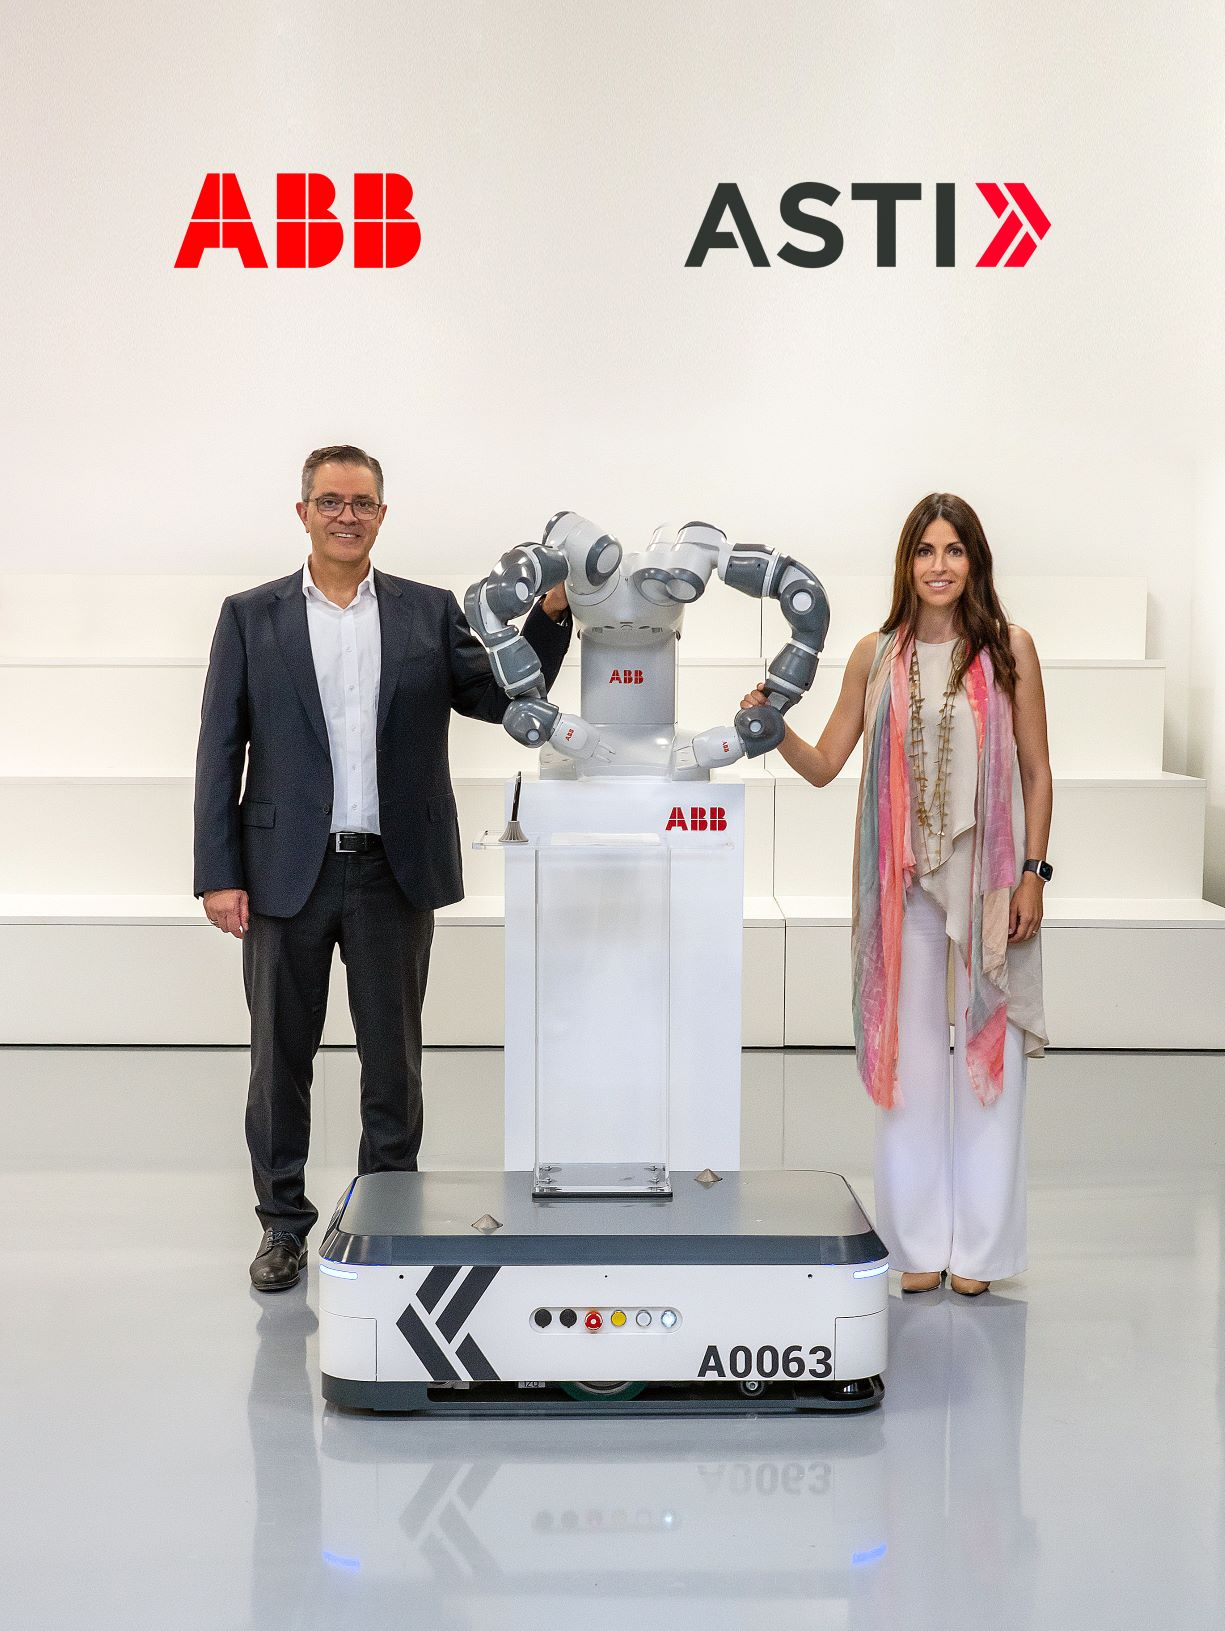 Sami Atiya, Presidente do negócio de Robotics & Discrete Automation na ABB e Veronica Pascual Boé, CEO da ASTI